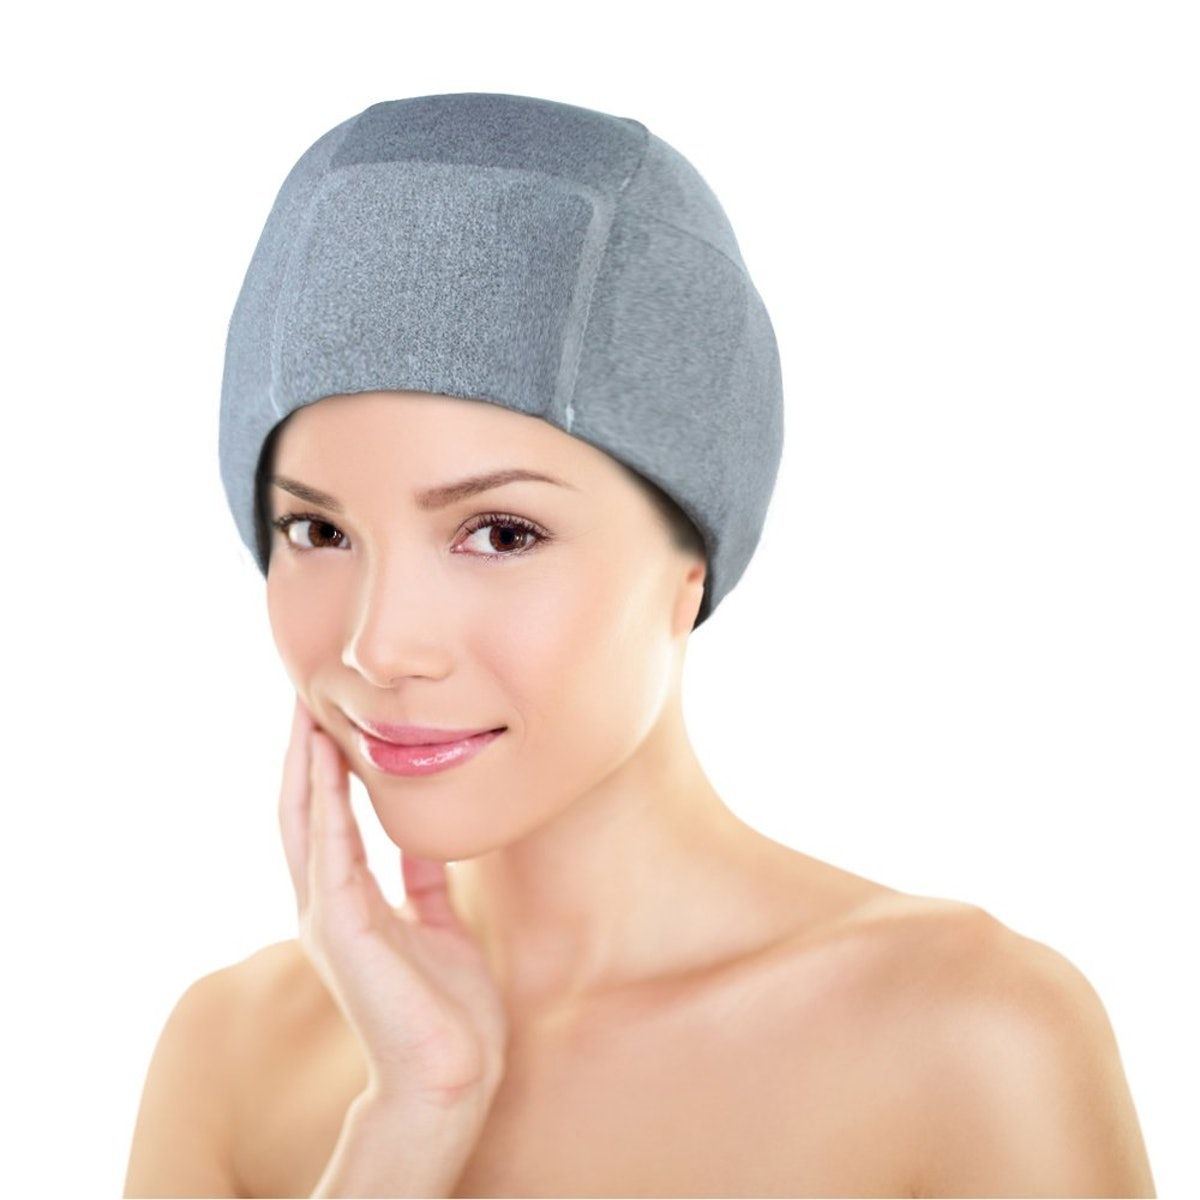 FOMI Gel Ice Hat